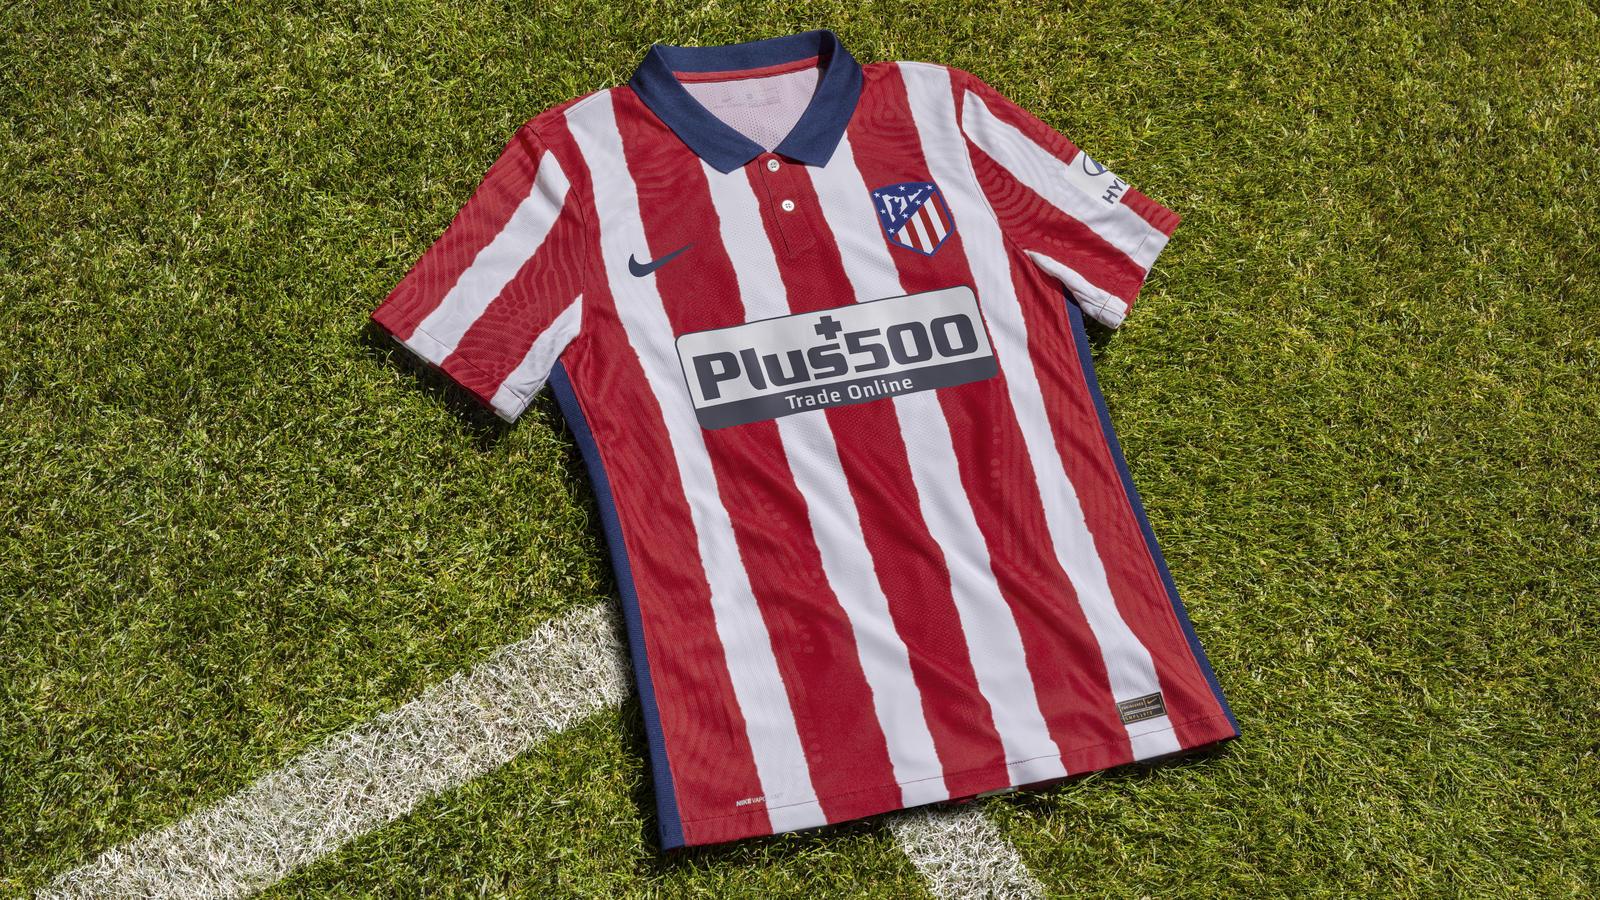 atletico-de-madrid-2020-21-home-kit